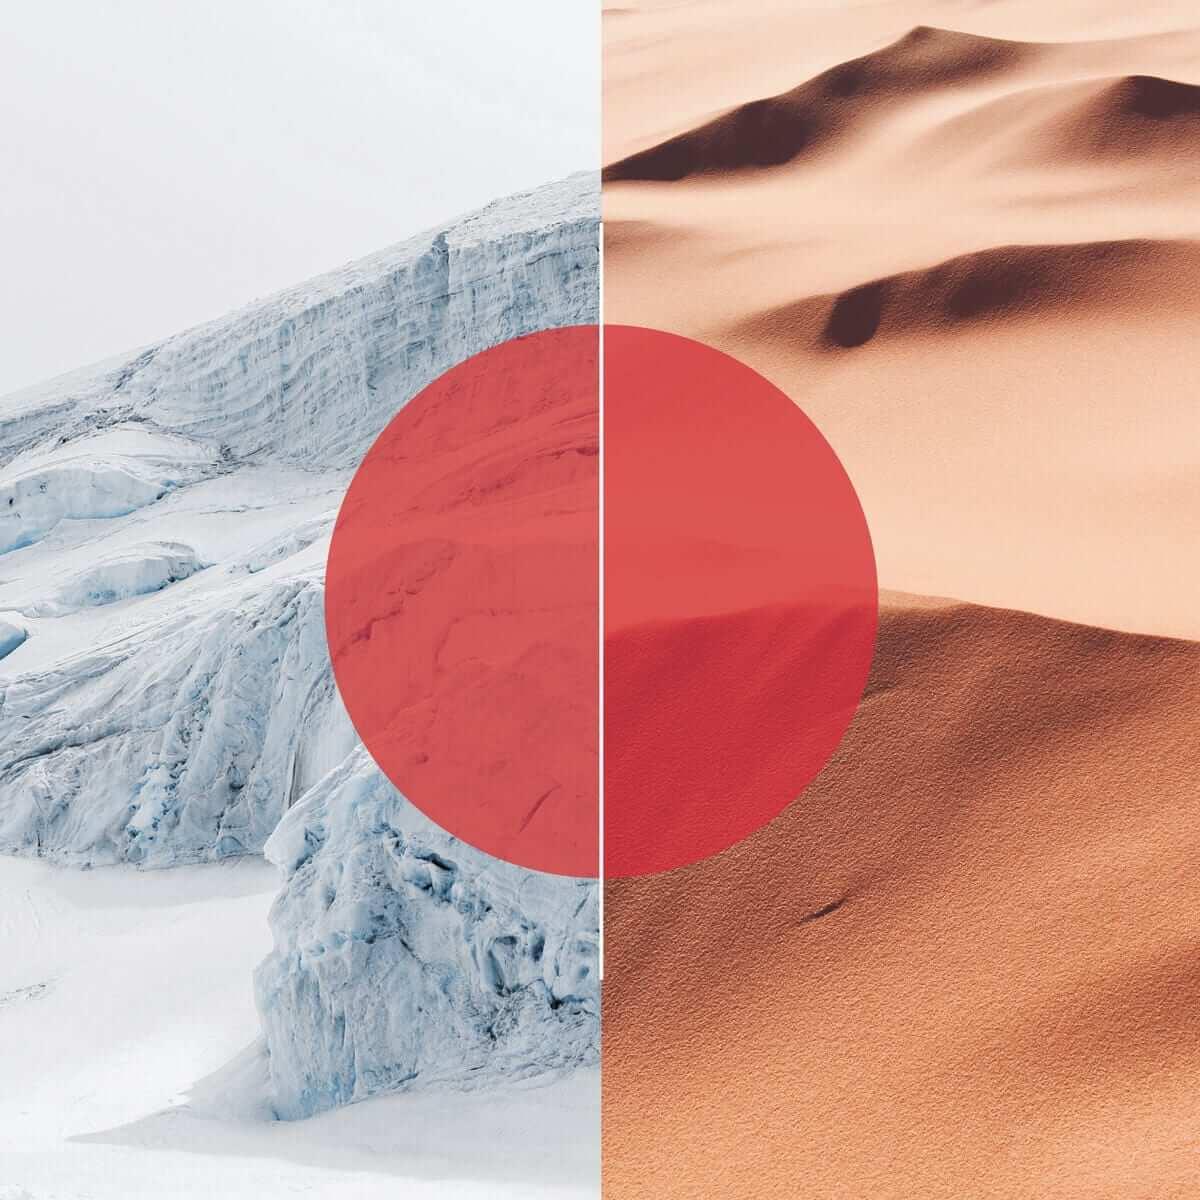 Contrast - Art by Richard Lerma